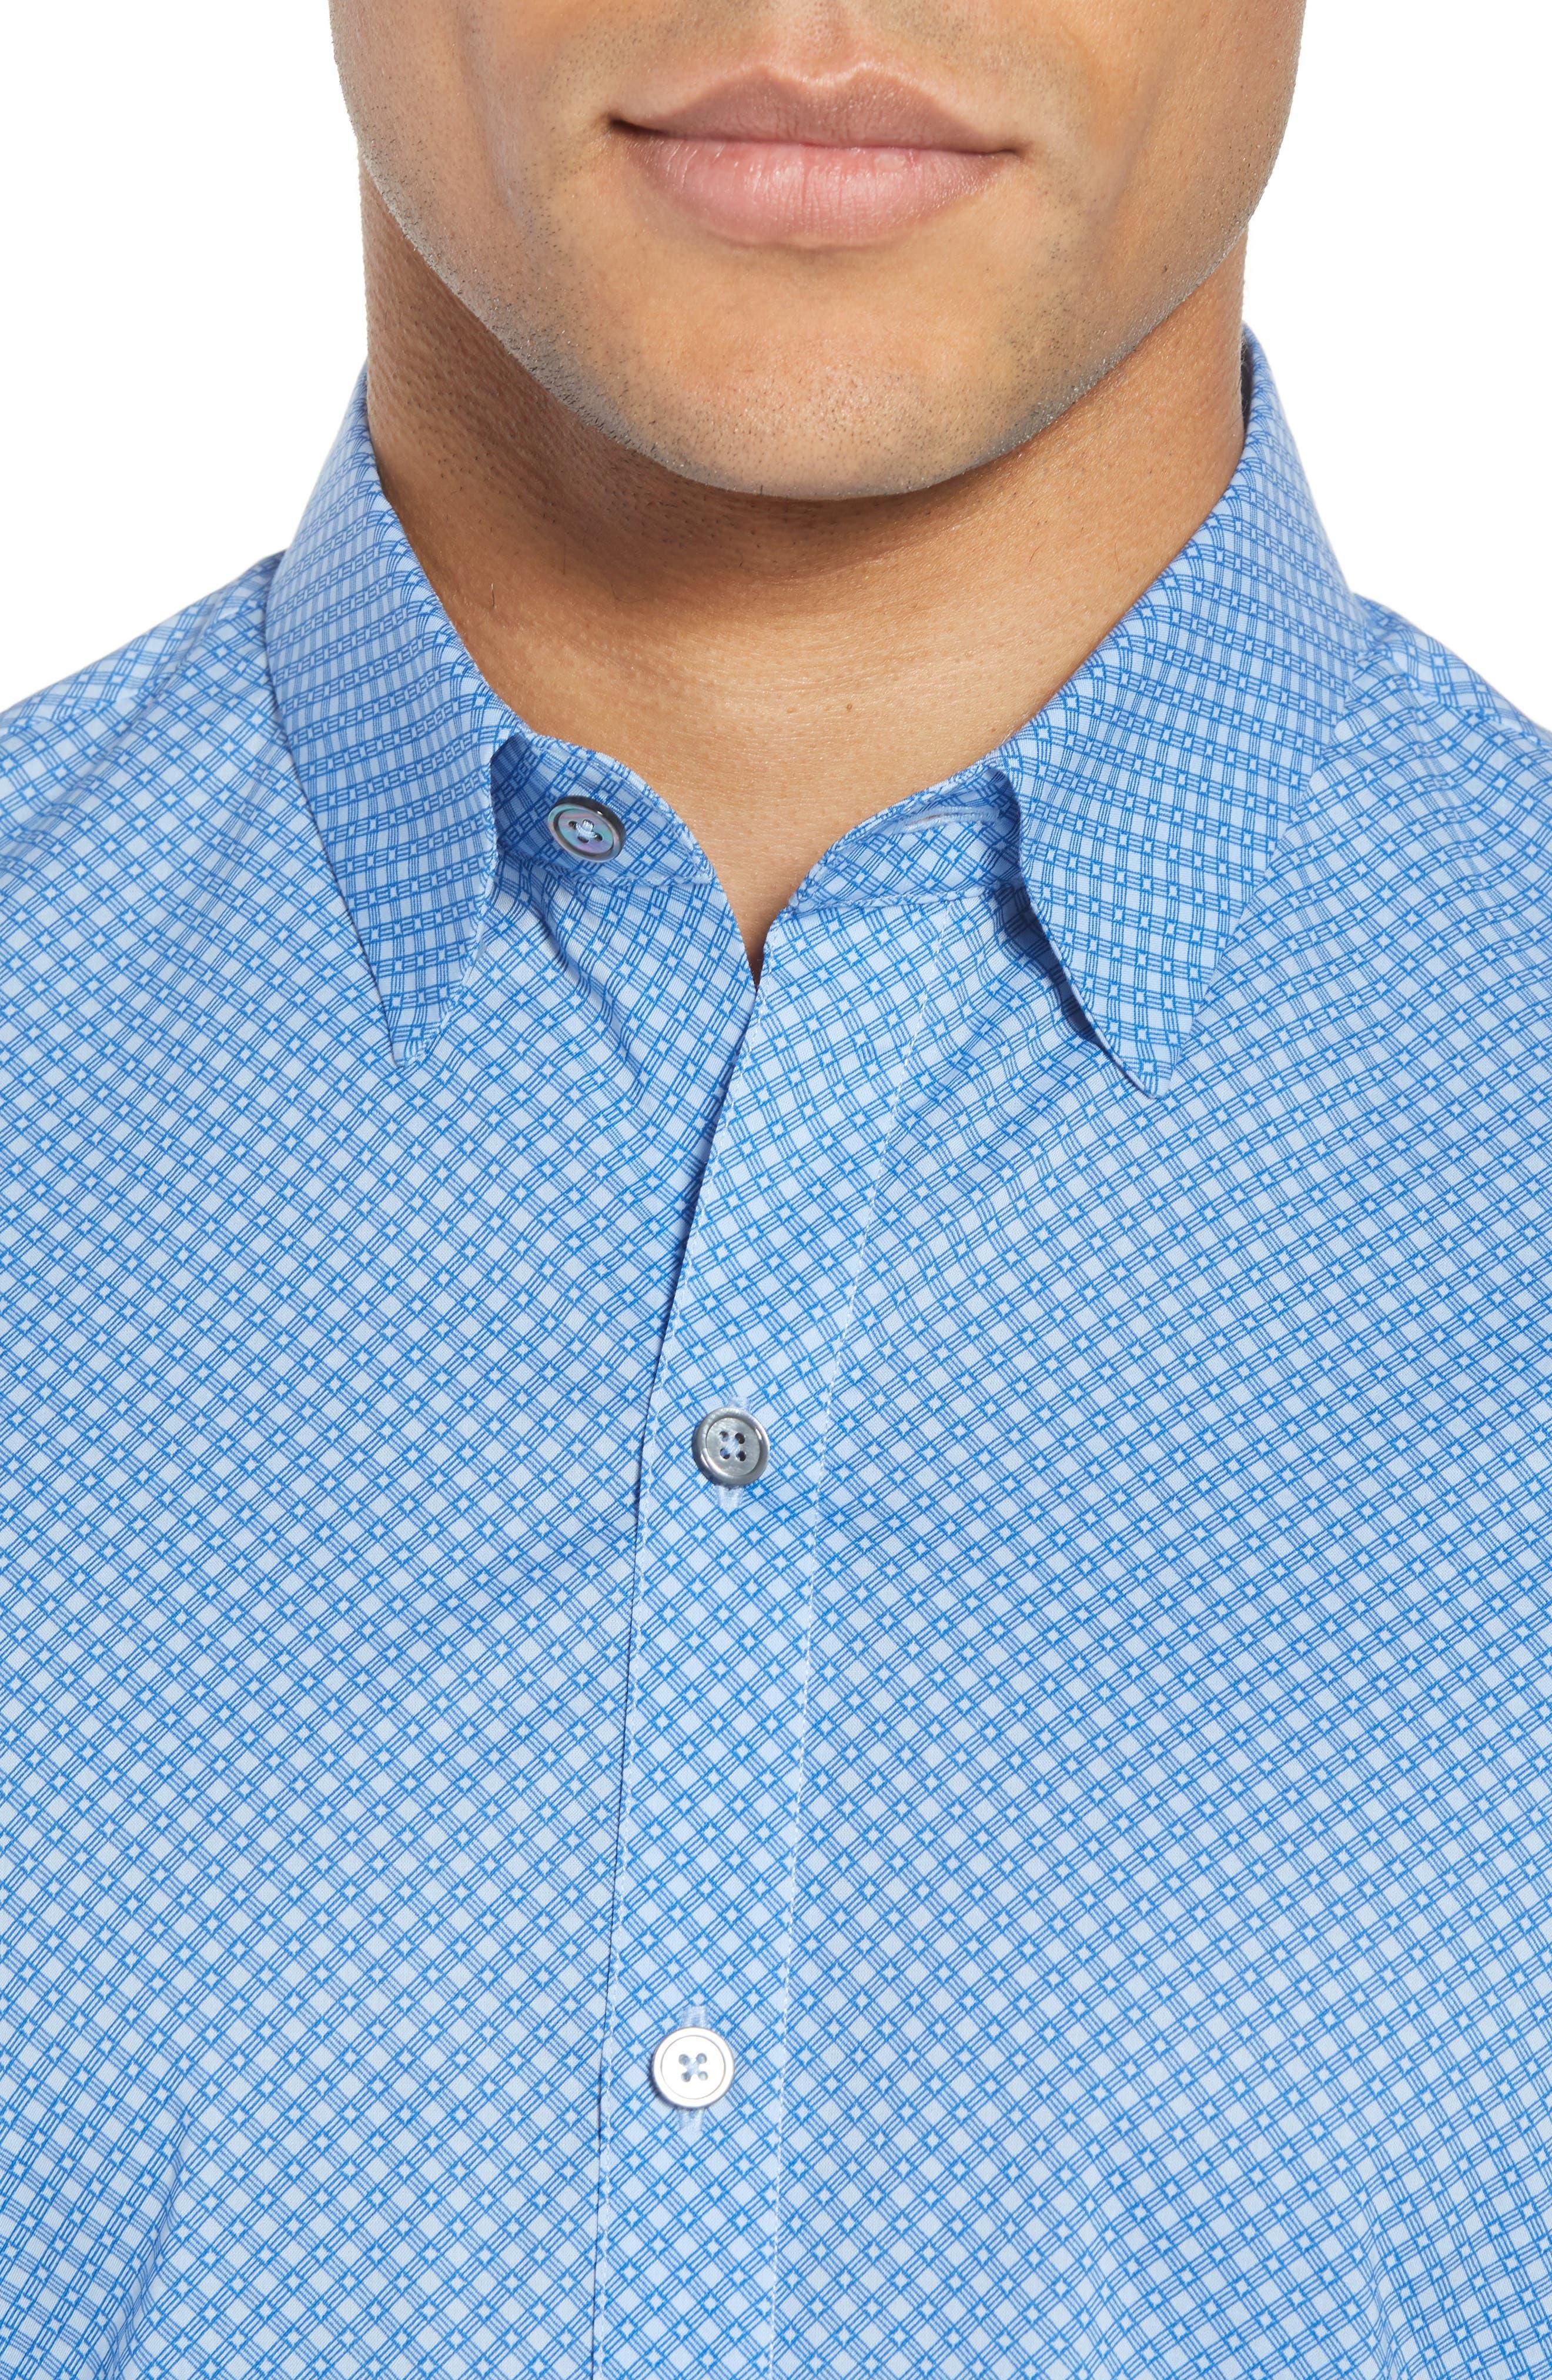 Ethan Slim Fit Sport Shirt,                             Alternate thumbnail 4, color,                             400